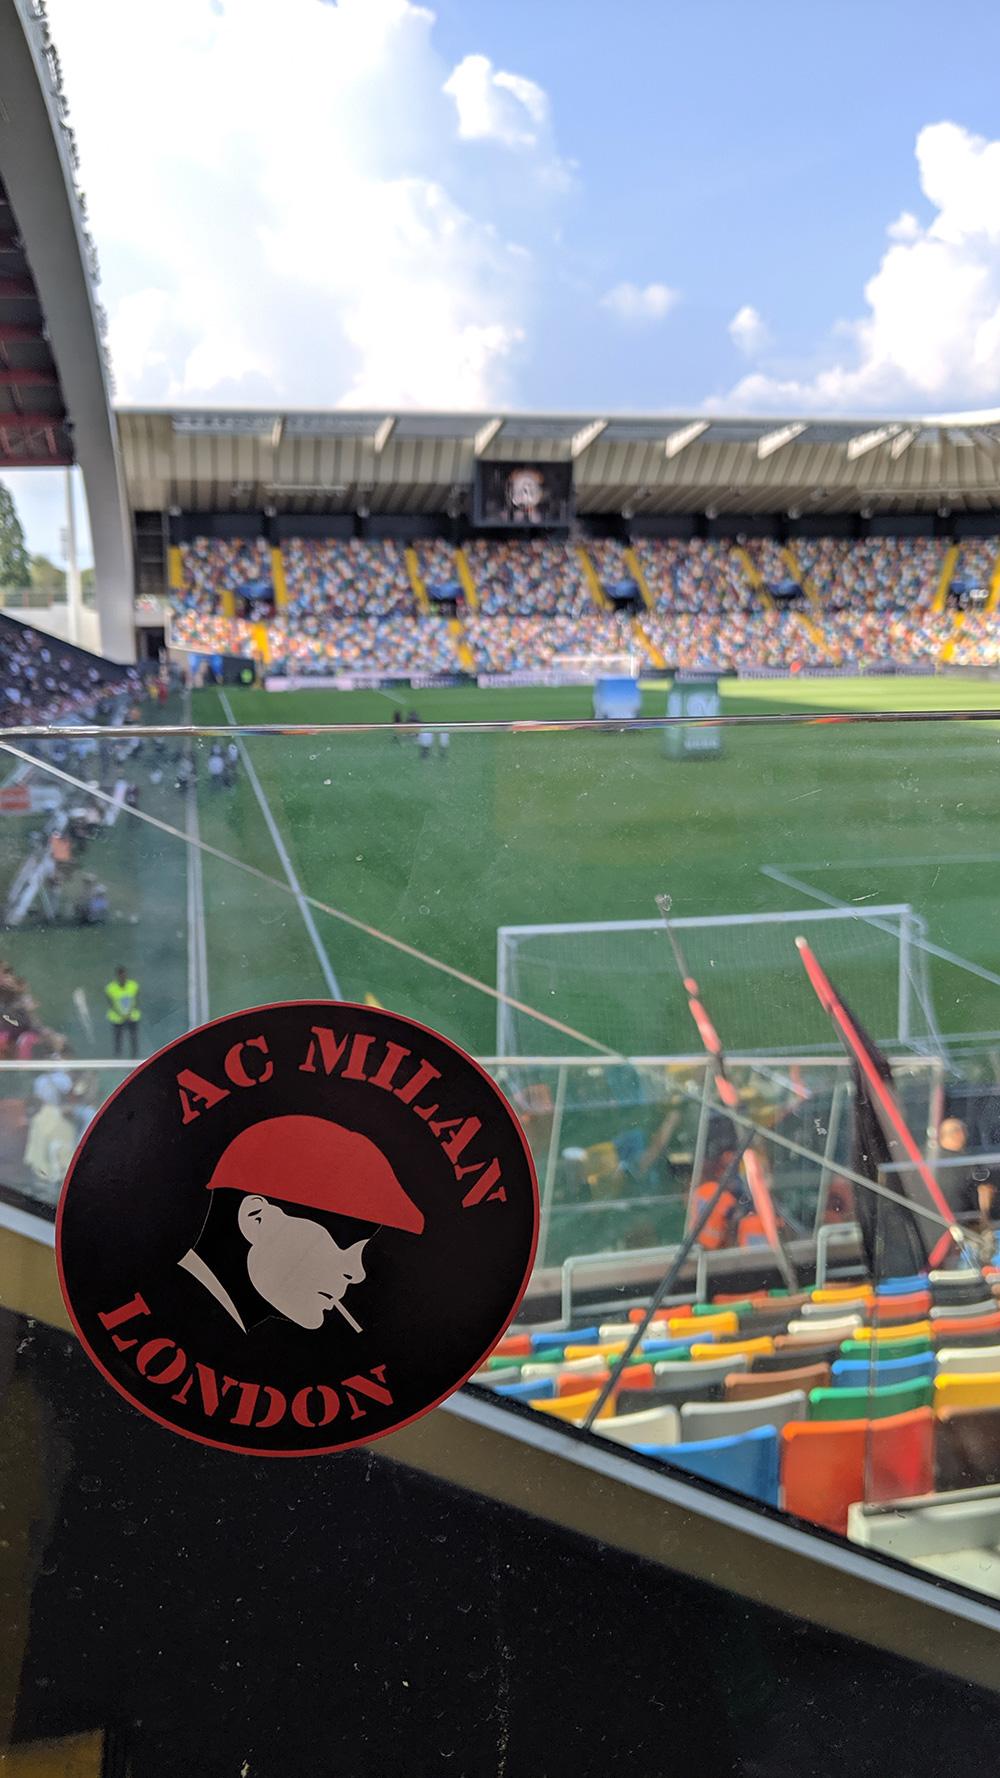 Milan Club London